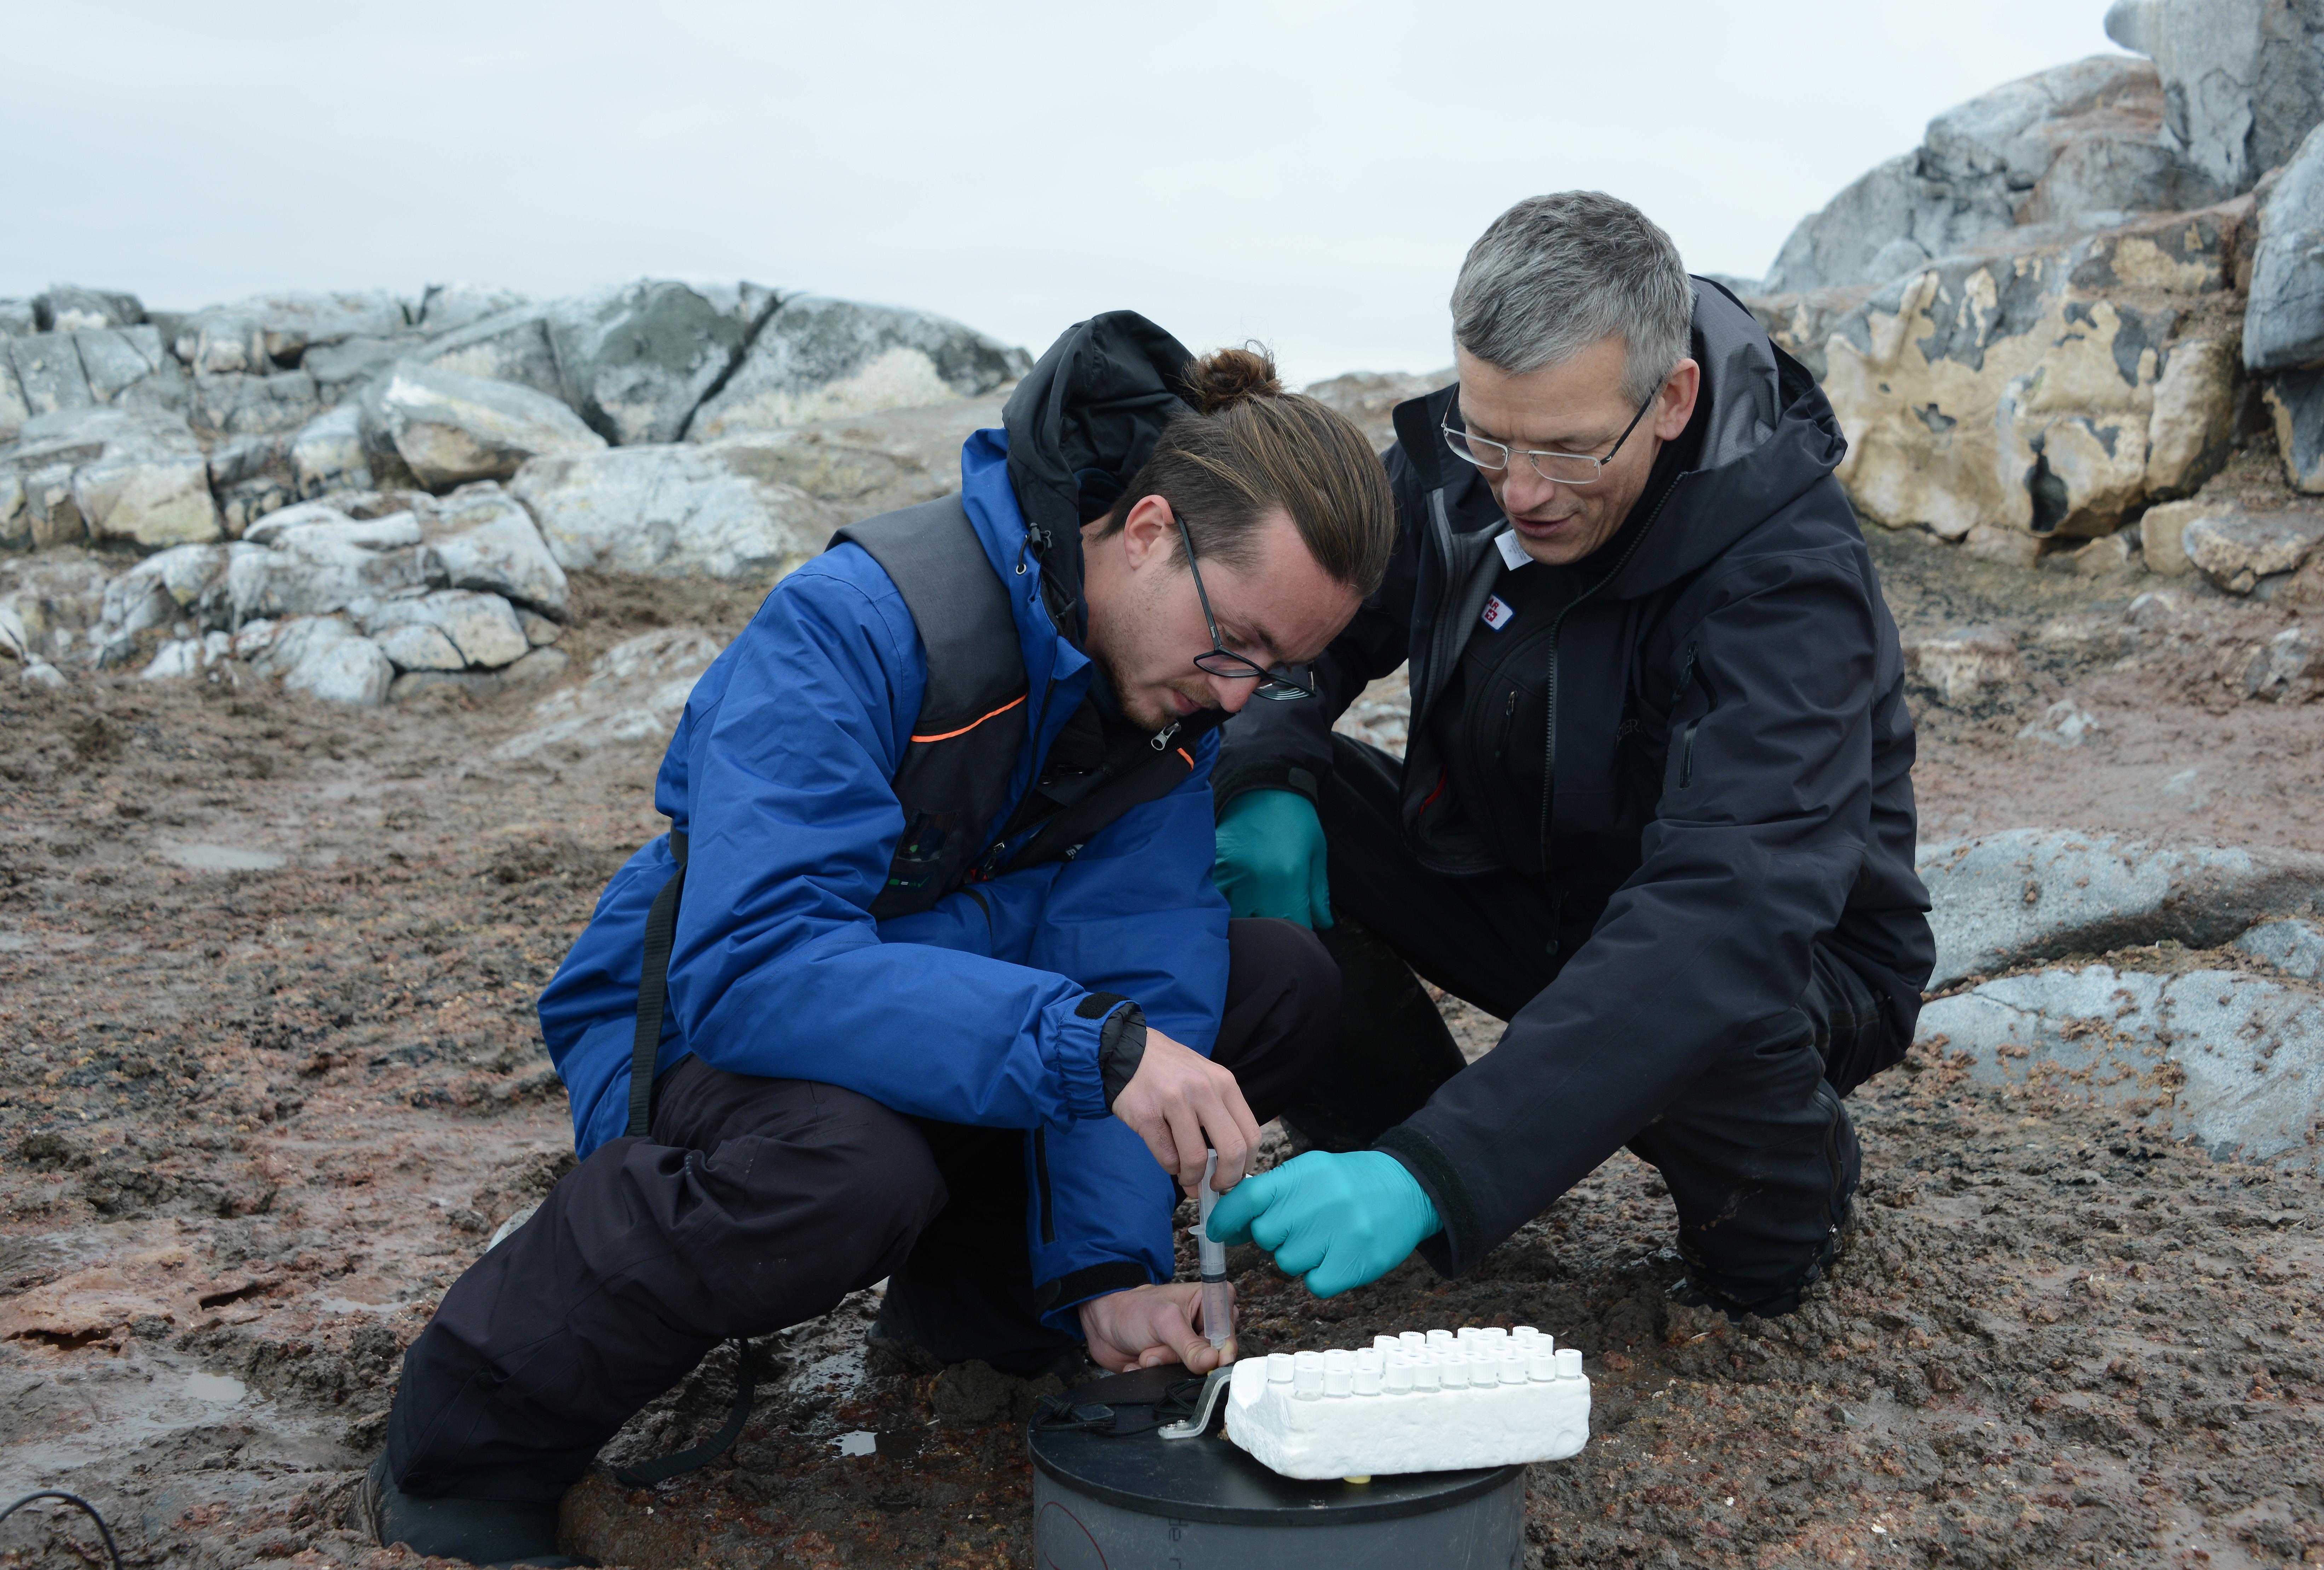 Bo Elberling investigates penguin guano in Antartica